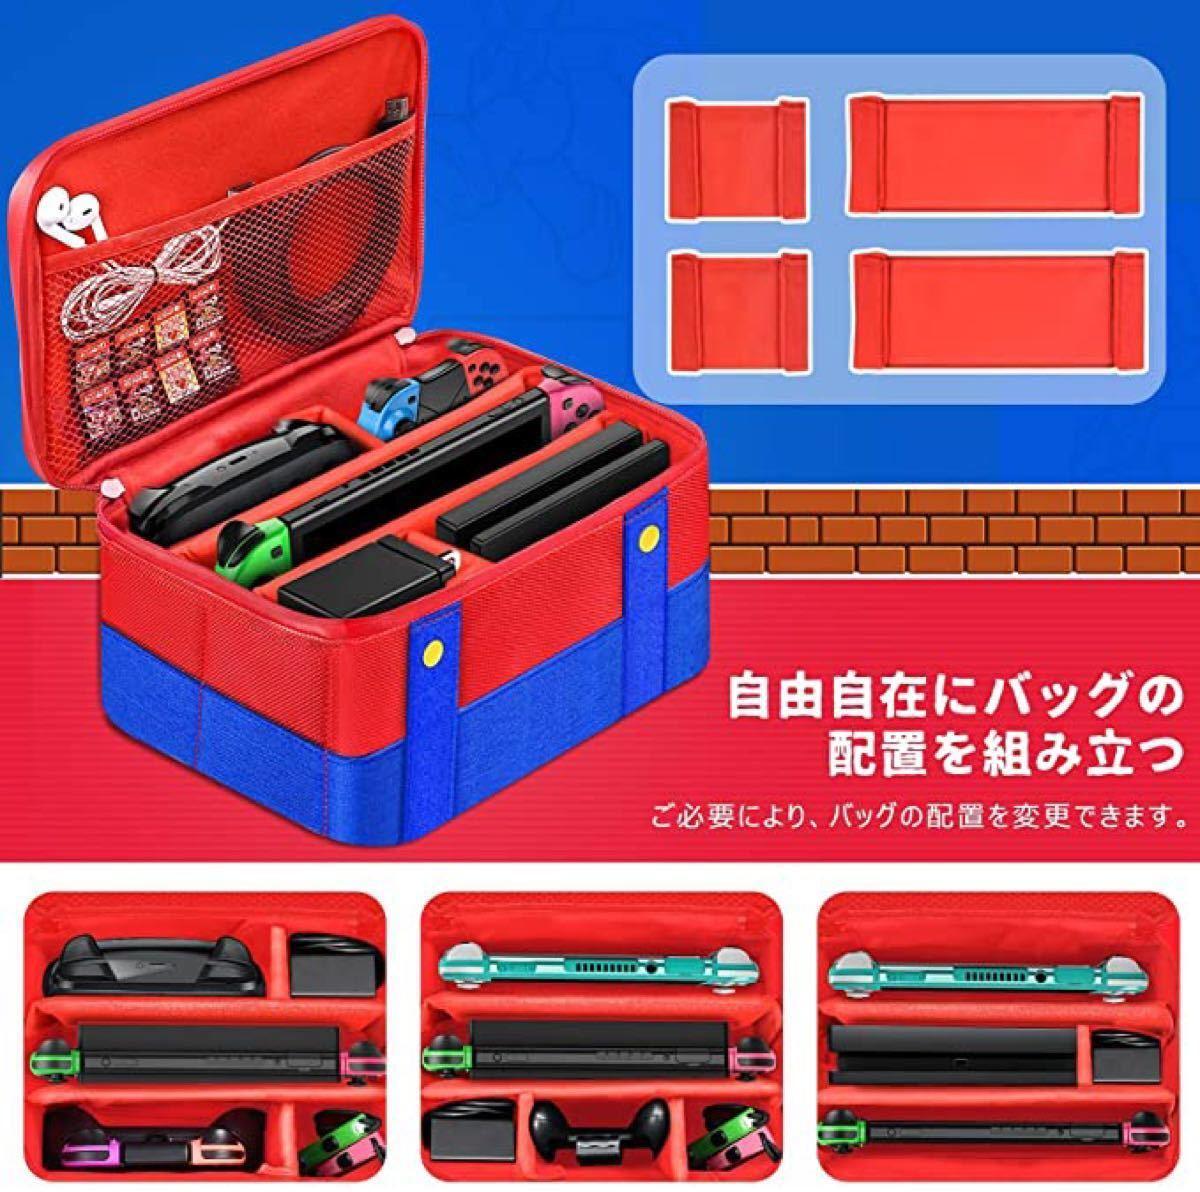 Switch ケース スイッチ ケース 収納バッグ スイッチ ケース かわいい